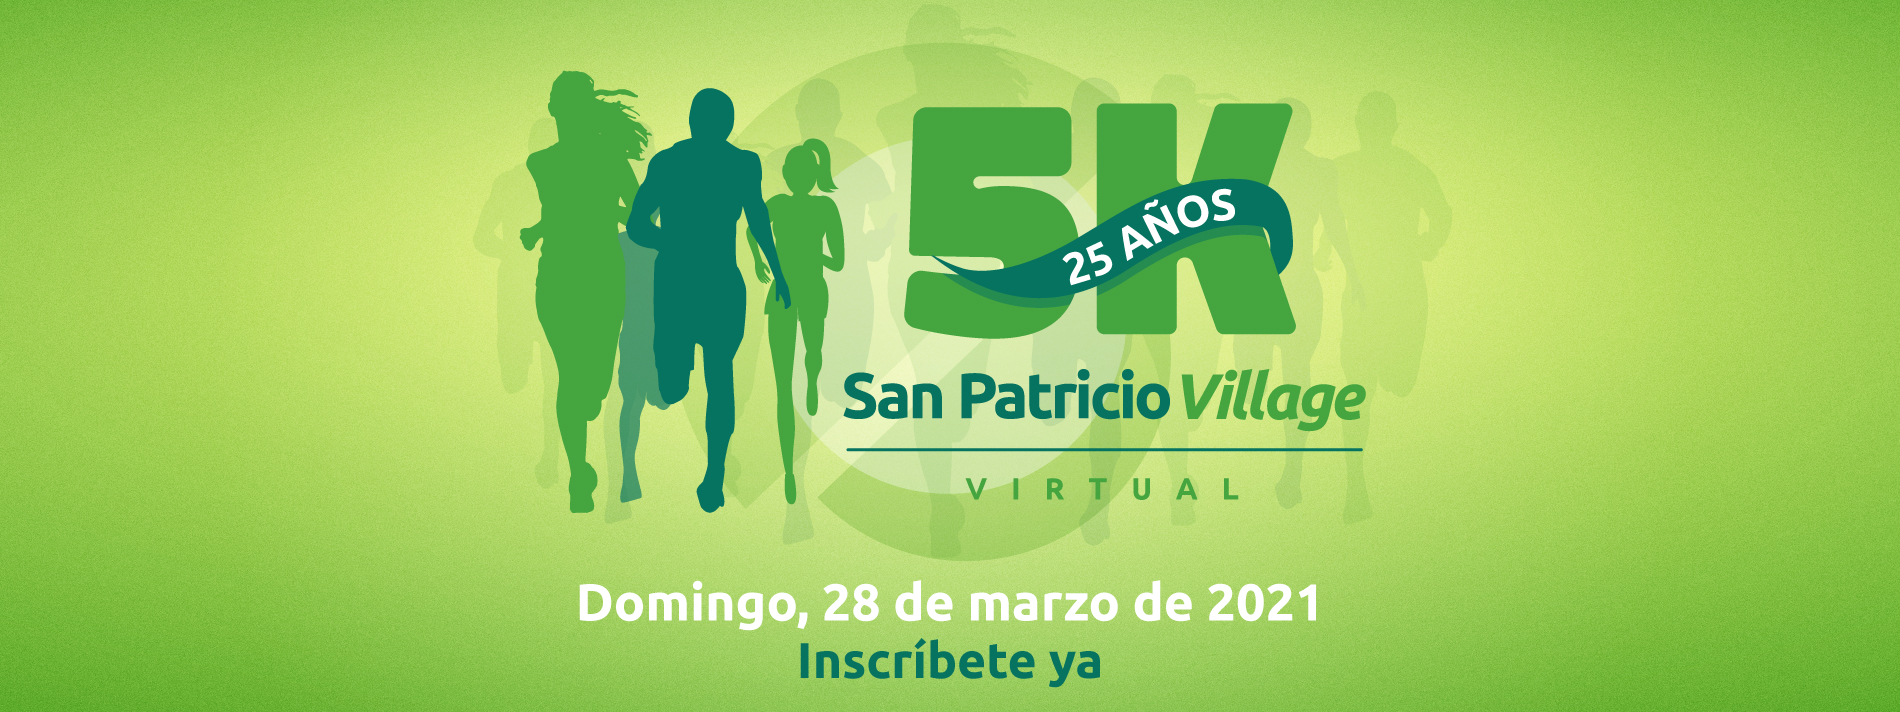 Banner for San Patricio Village Virtual 5K